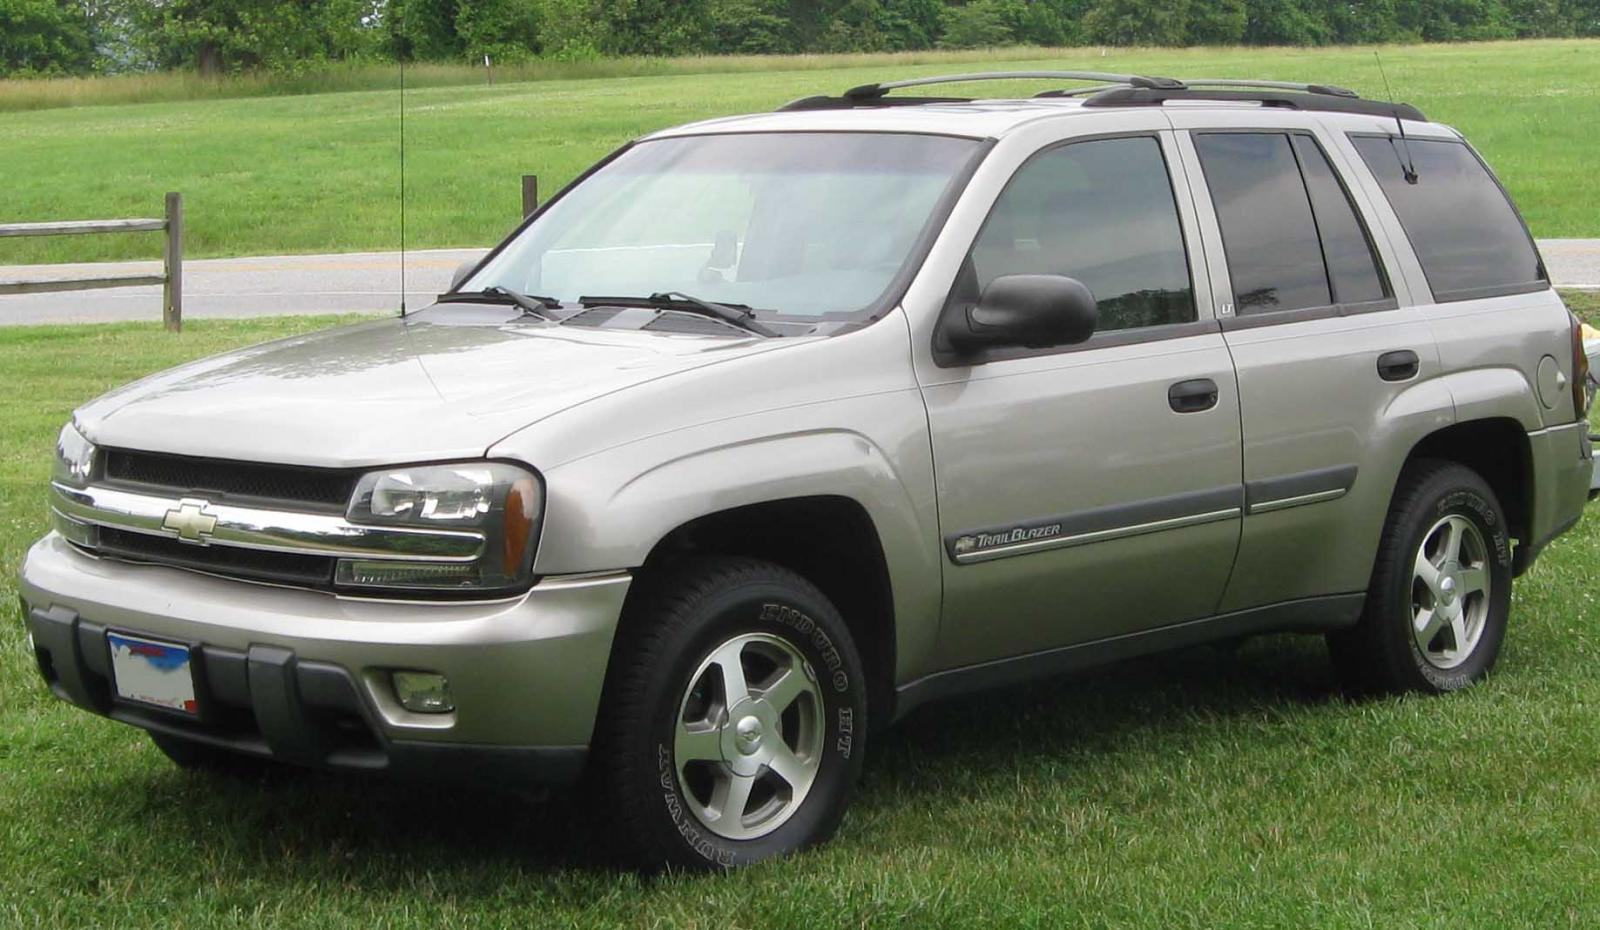 2002 Chevrolet TrailBlazer #7 Chevrolet TrailBlazer #7 800 1024 1280 1600  origin ...